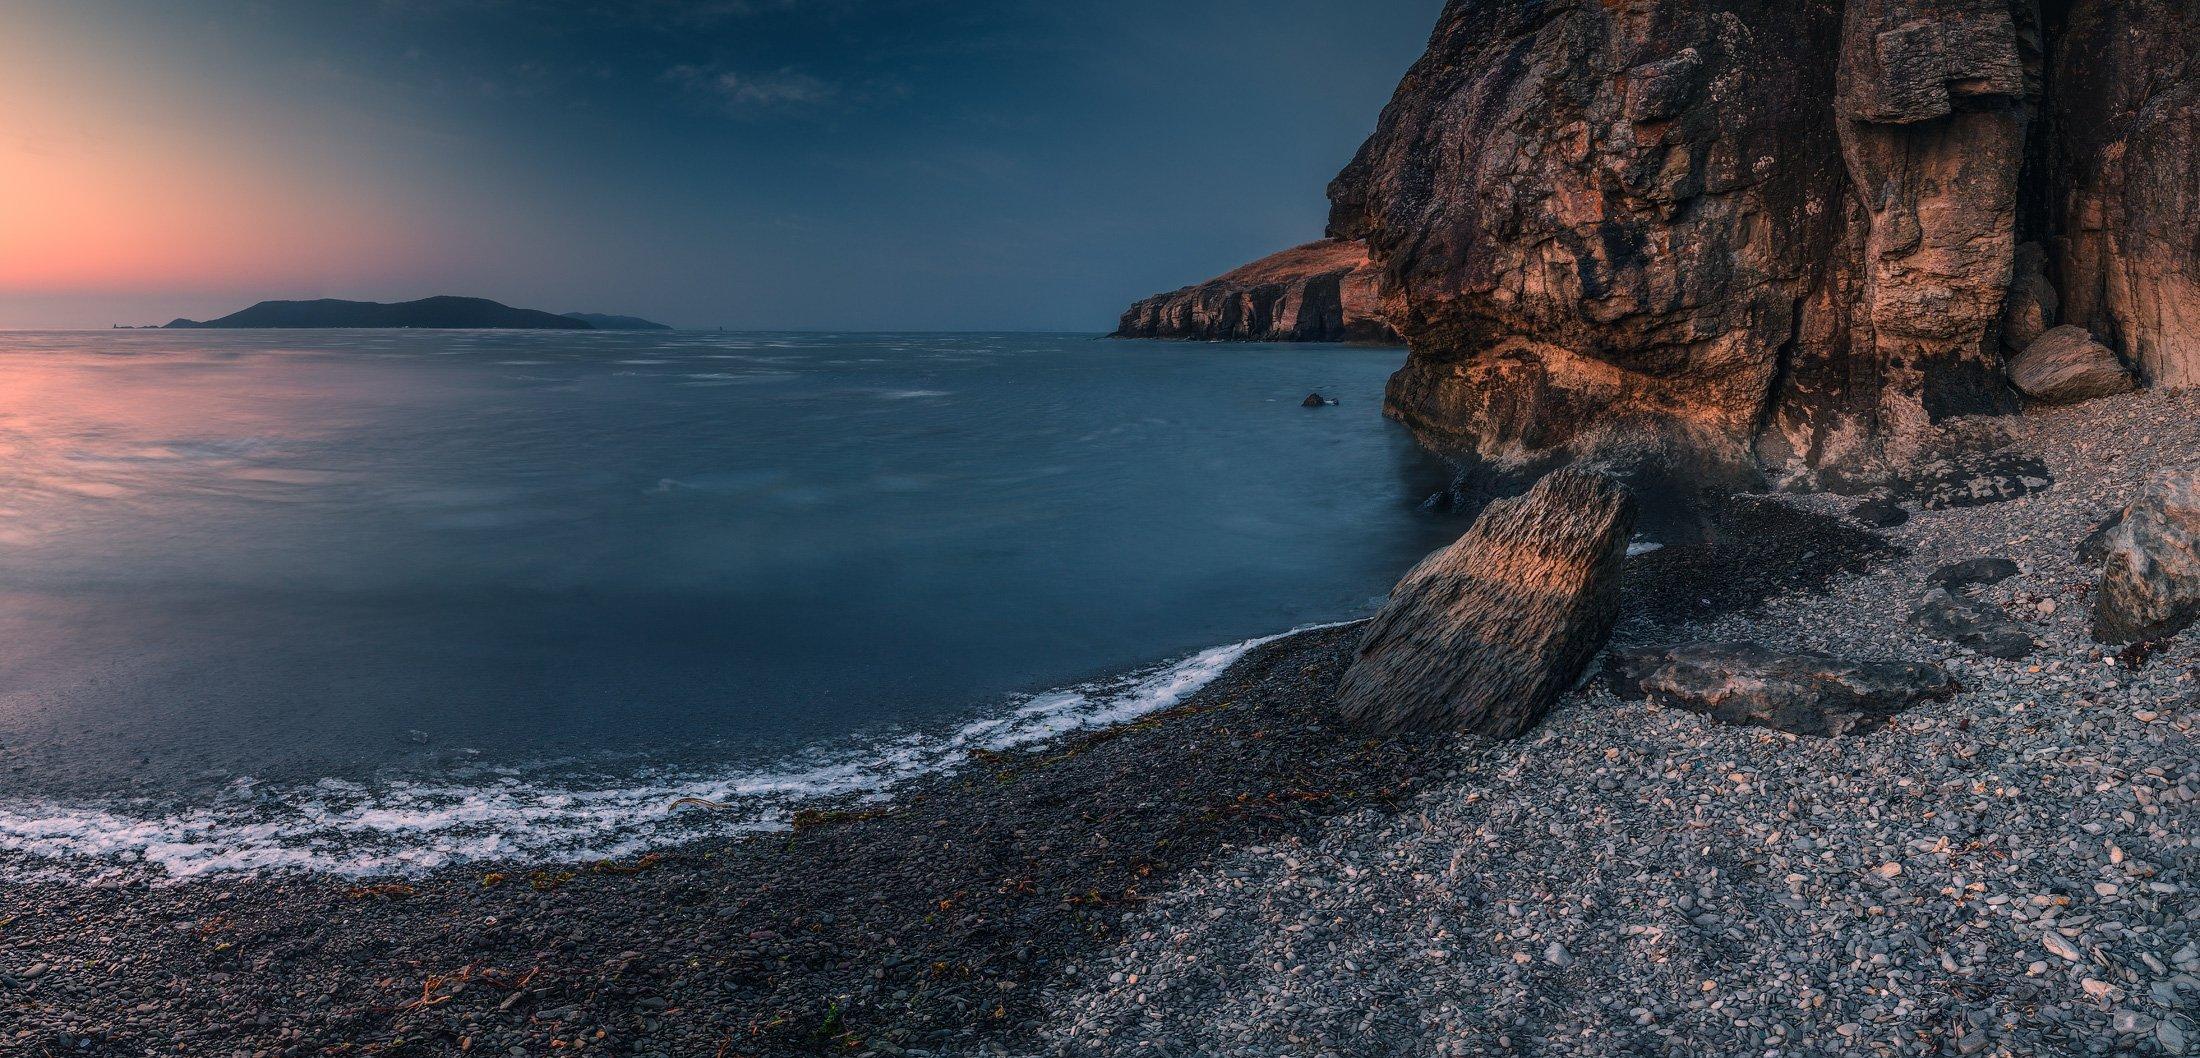 панорама, утро, мое, скалы, Андрей Кровлин